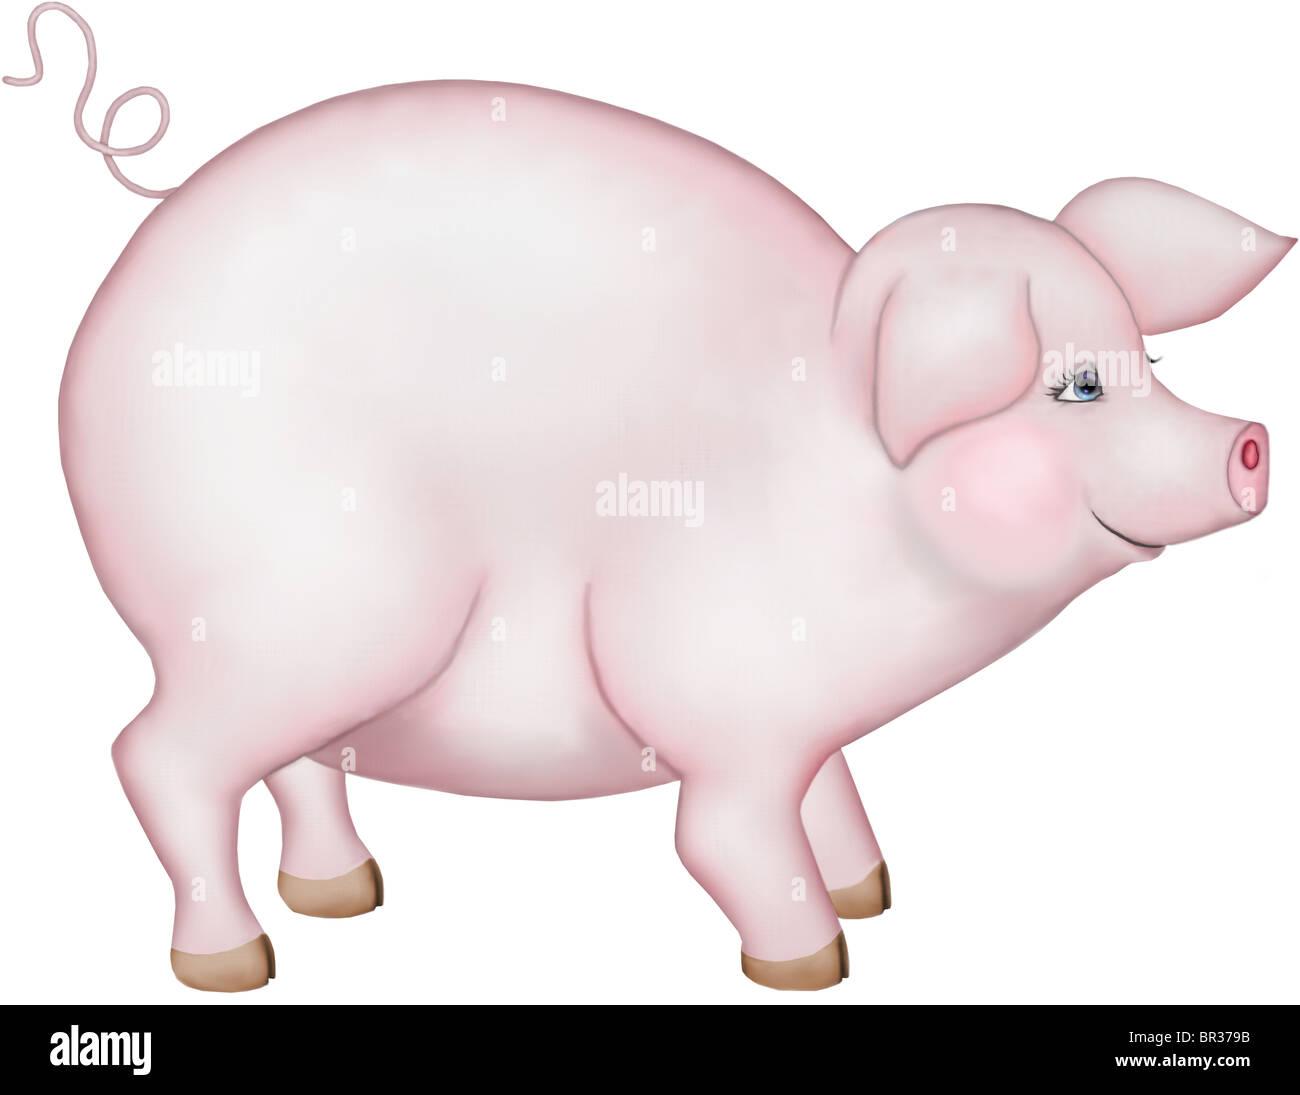 Un dessin d'un cochon robuste Photo Stock